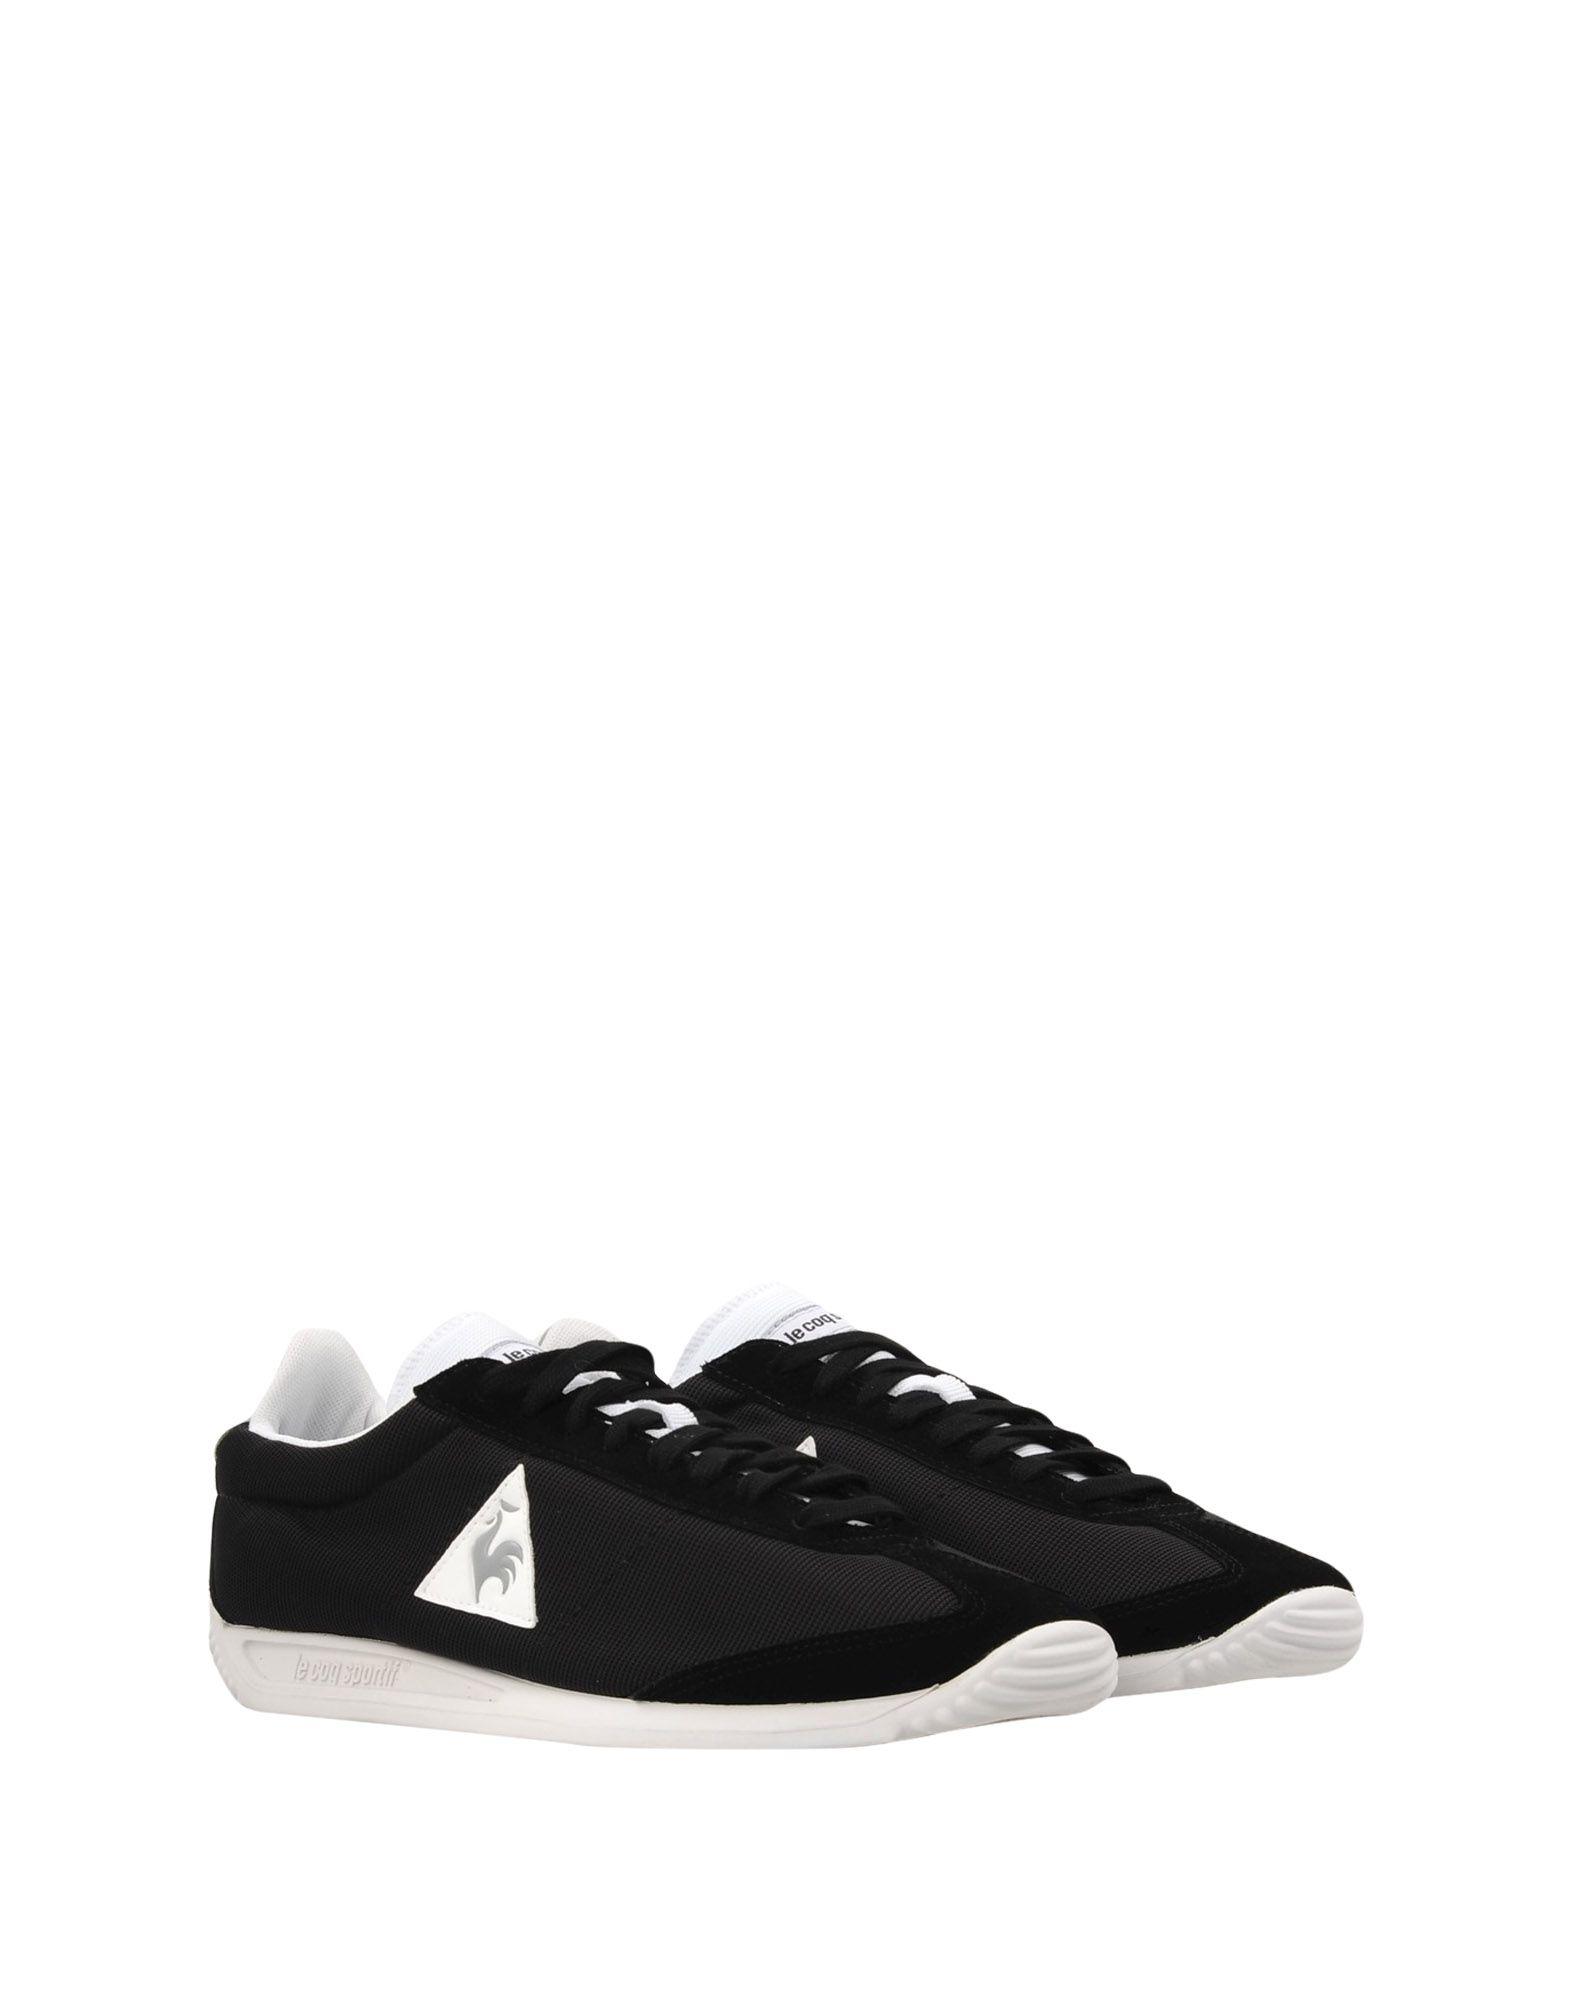 Rabatt echte  Schuhe Le Coq Sportif  echte Quartz Nylon  11441577BL 4a05a9